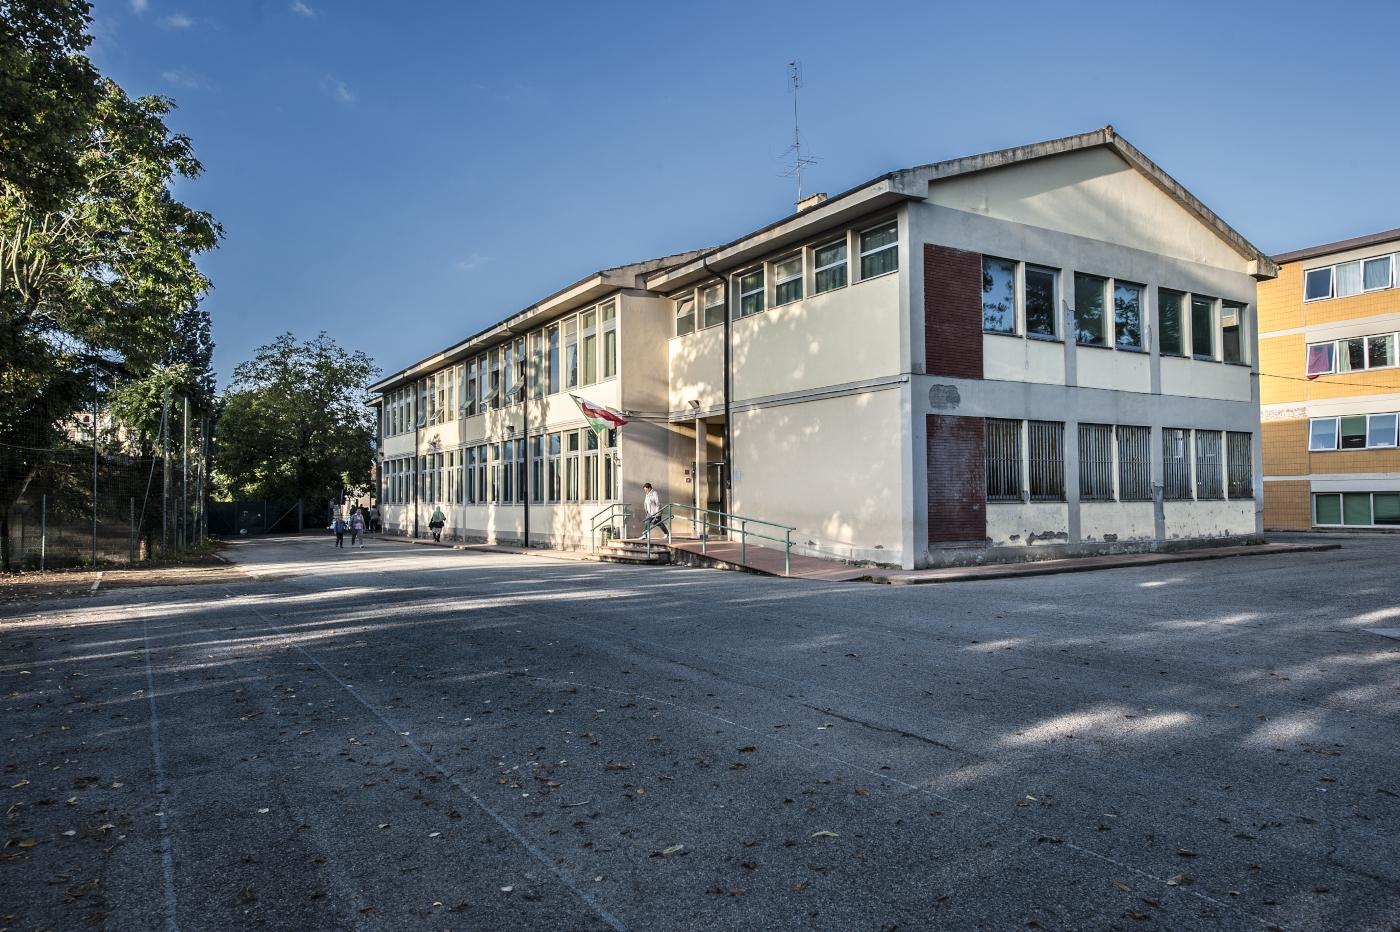 primaria-capoluogo-don-minzoni-2014